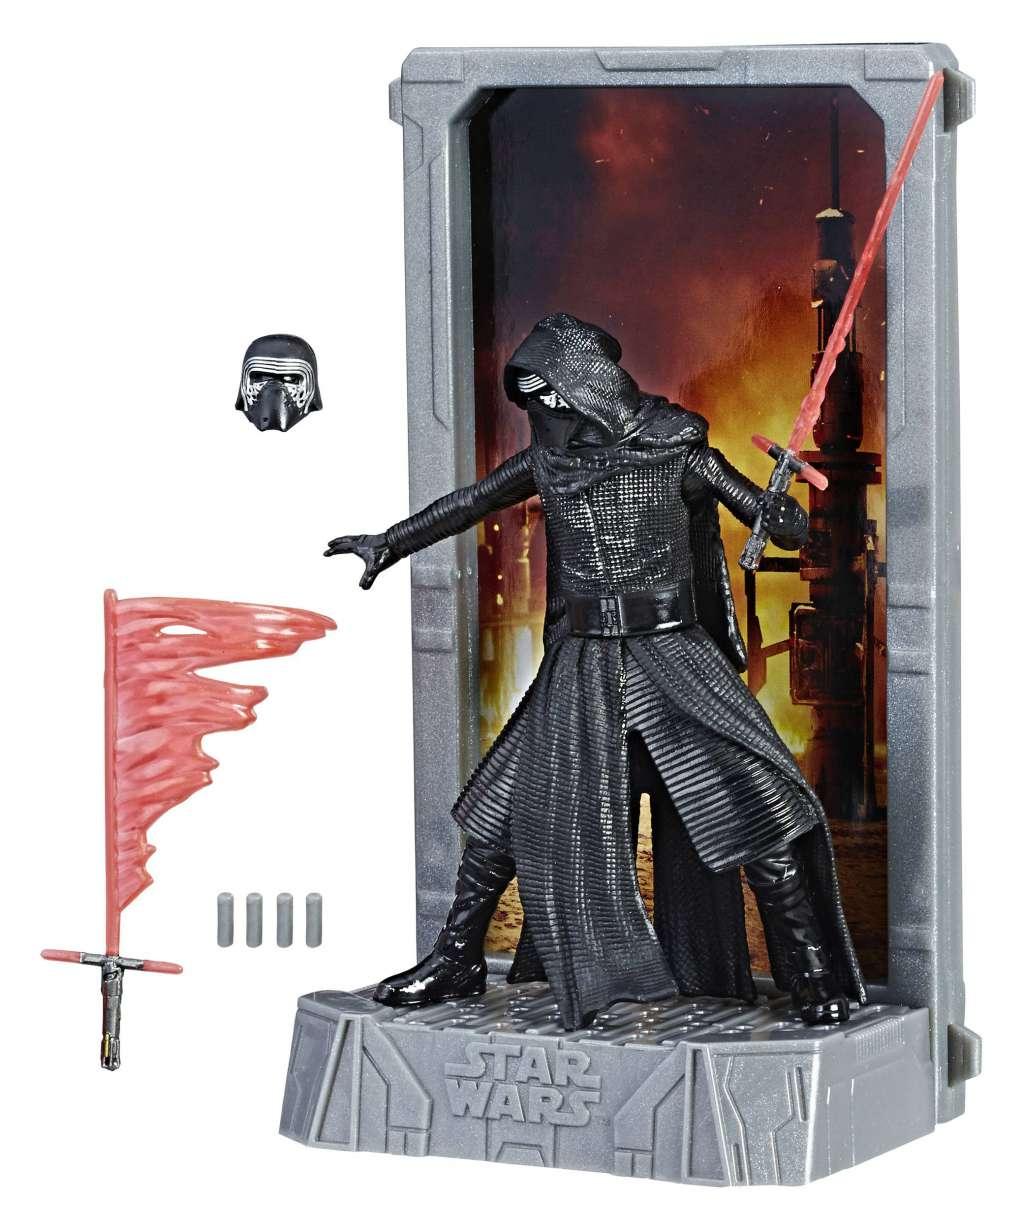 Star Wars Black Series Titanium Figuras Diecast 2017 Wave 2 04